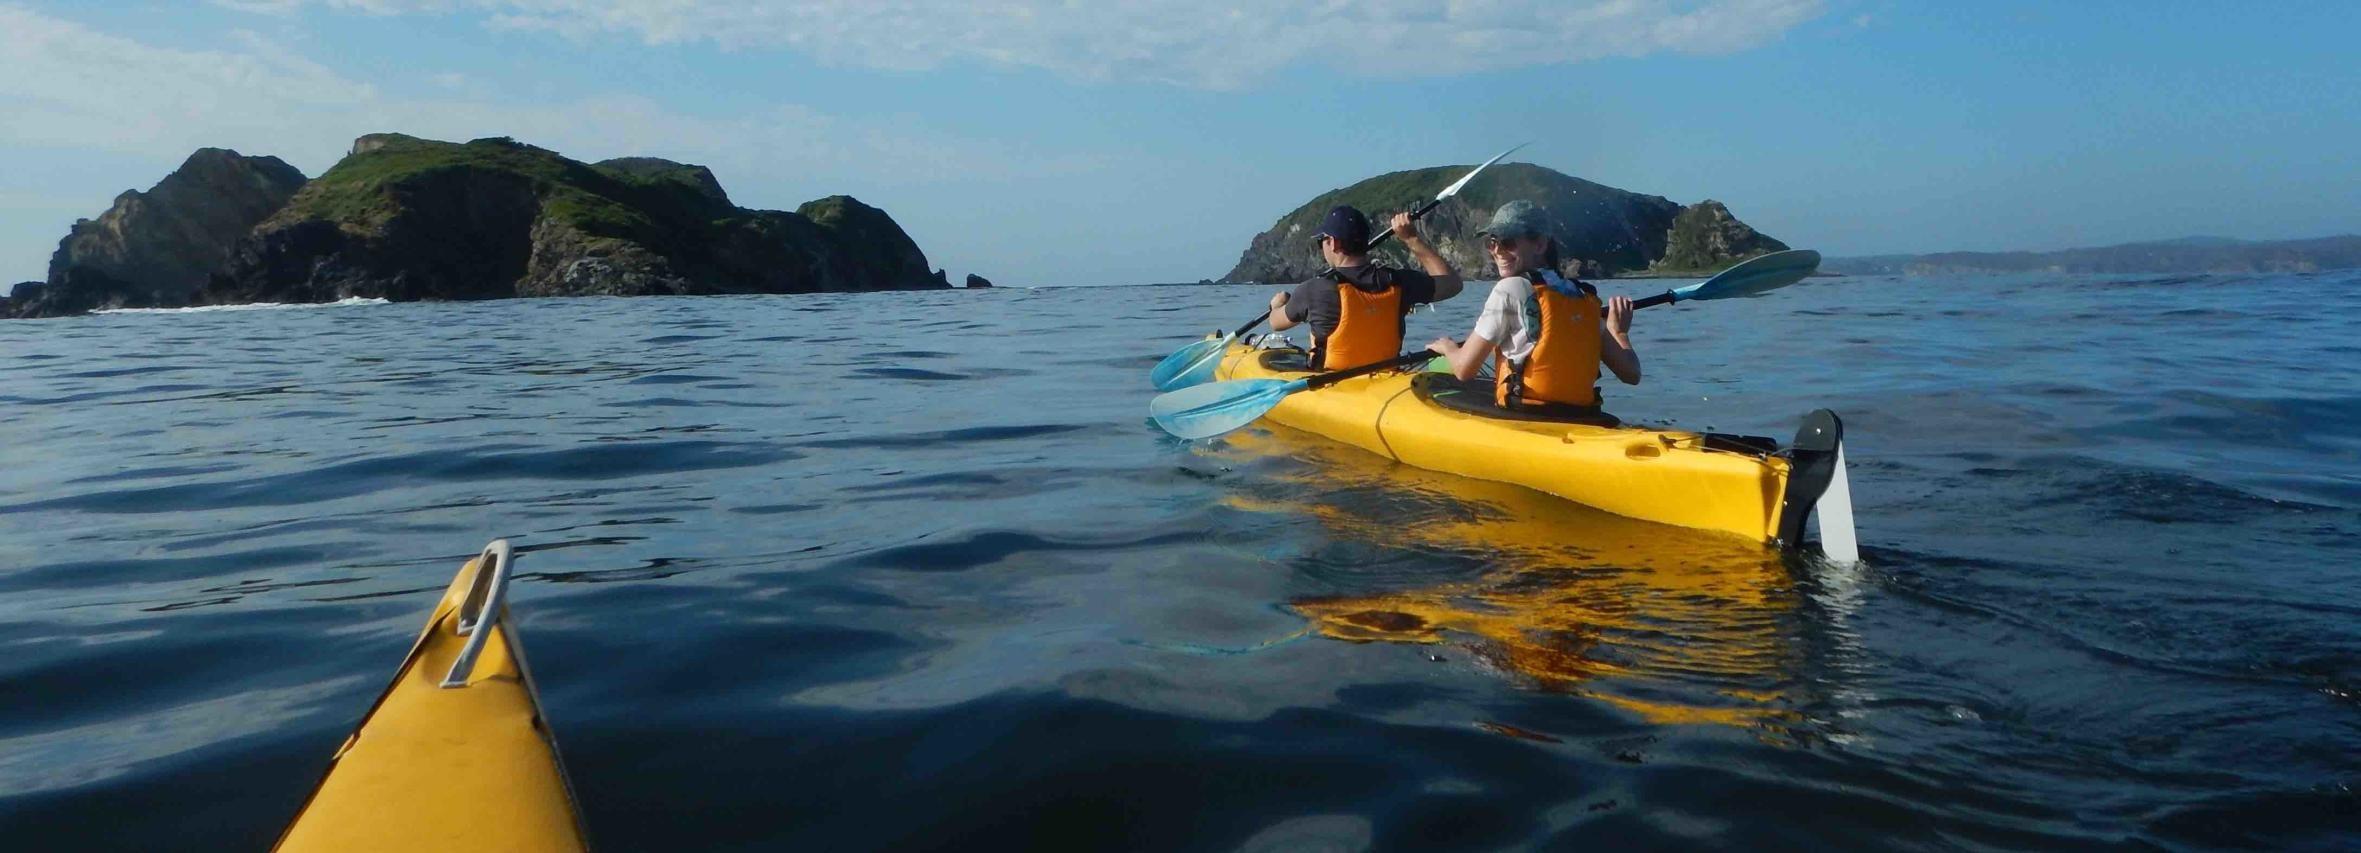 Tollgate Islands: Half-Day Sea Kayak Tour